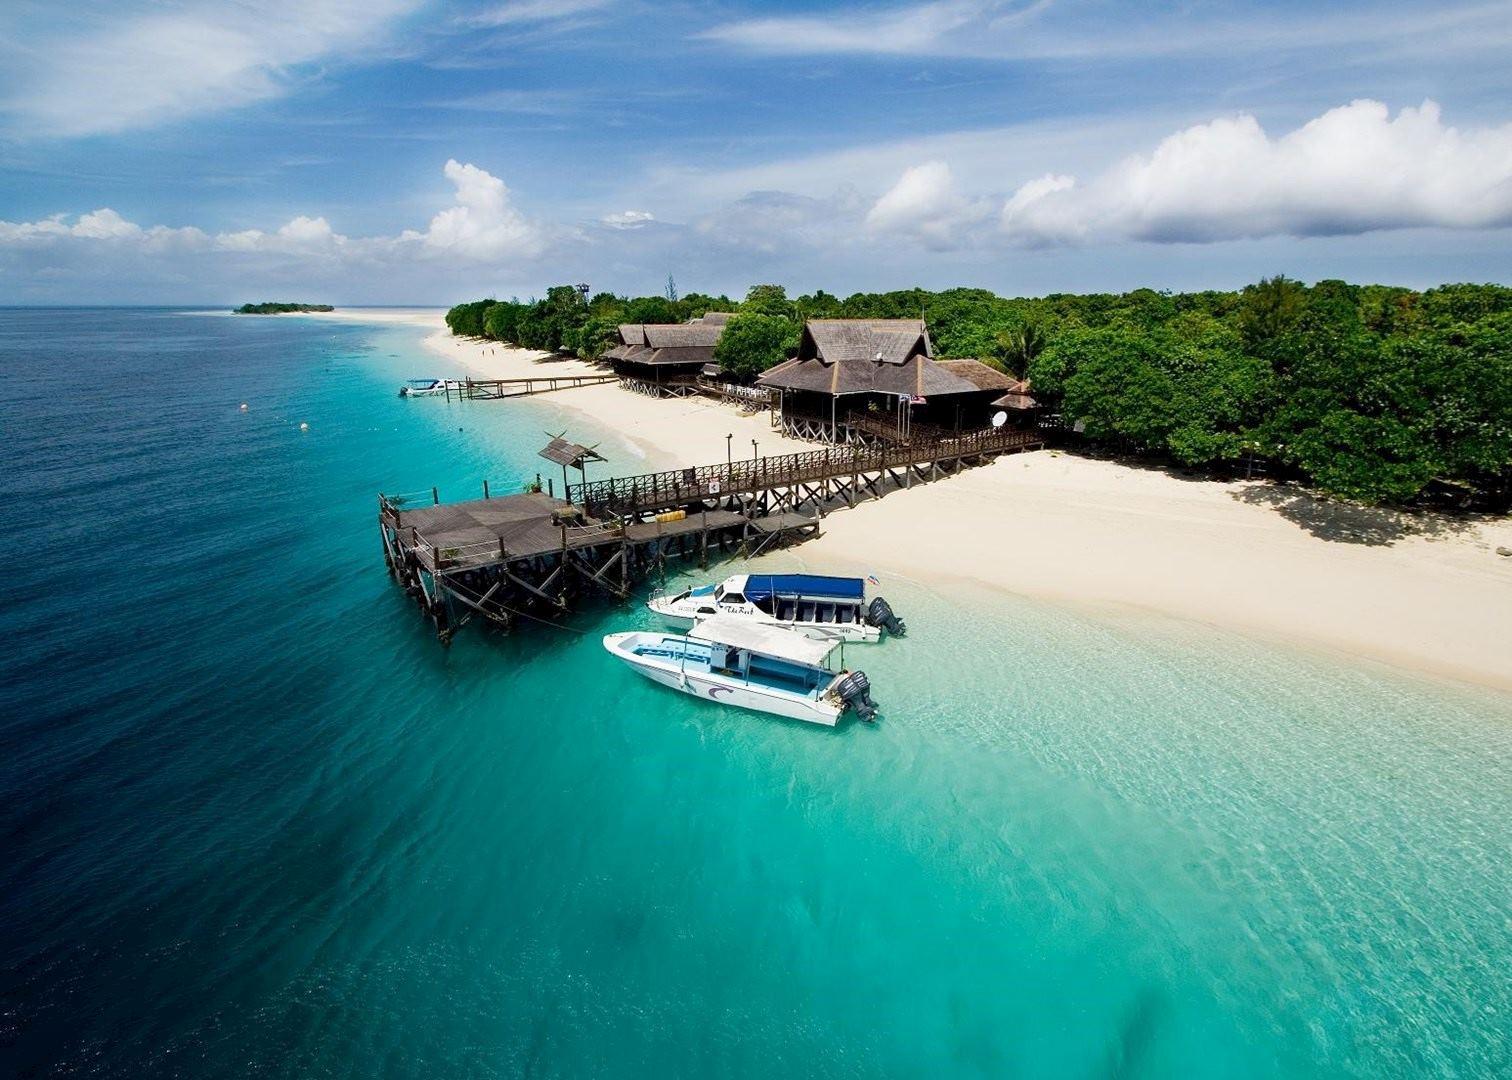 Mataking Island Reef Dive Resort